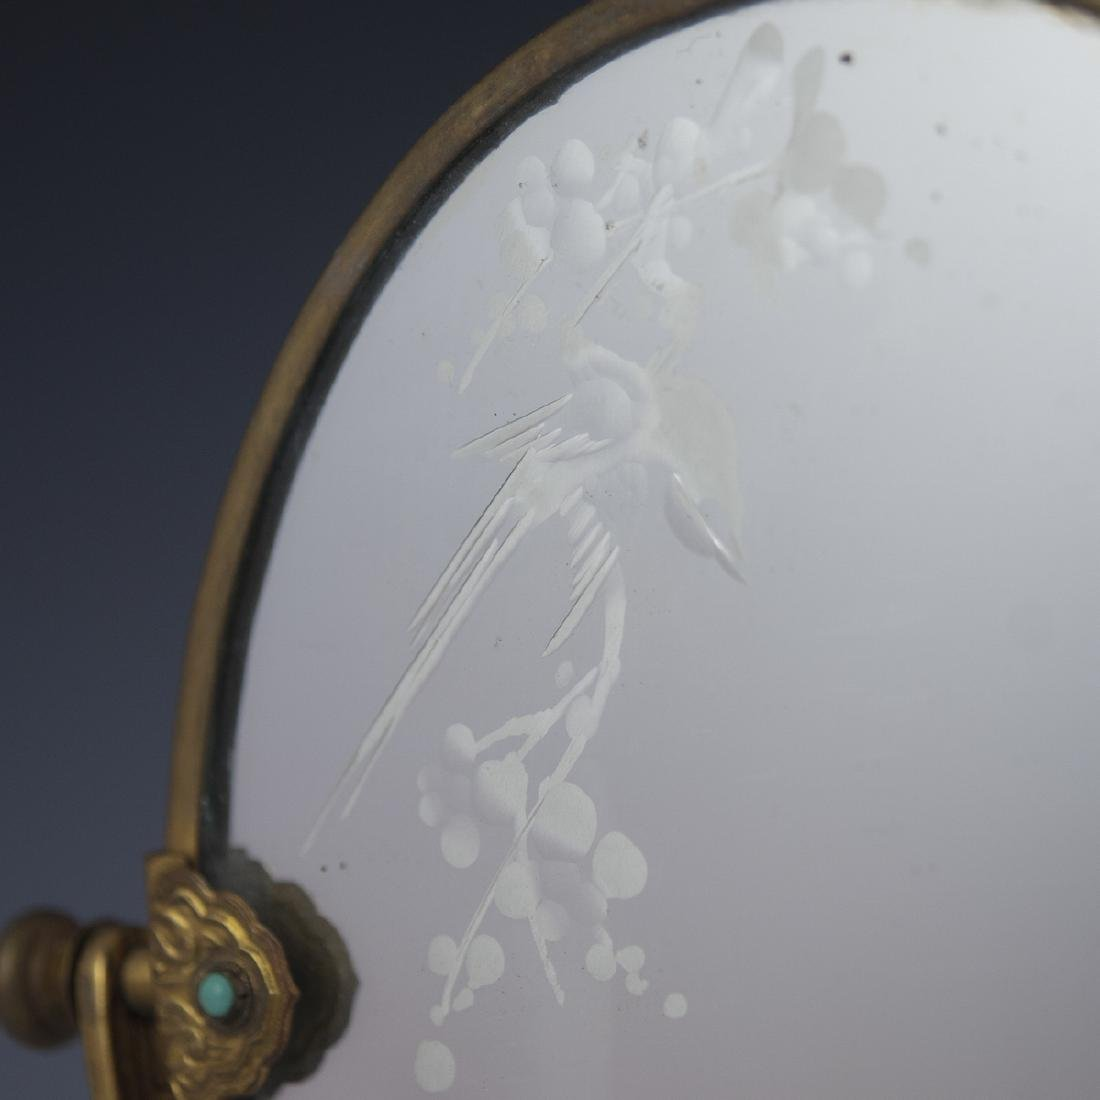 Chinese Cloisonne Enameled Vanity Mirror - 6